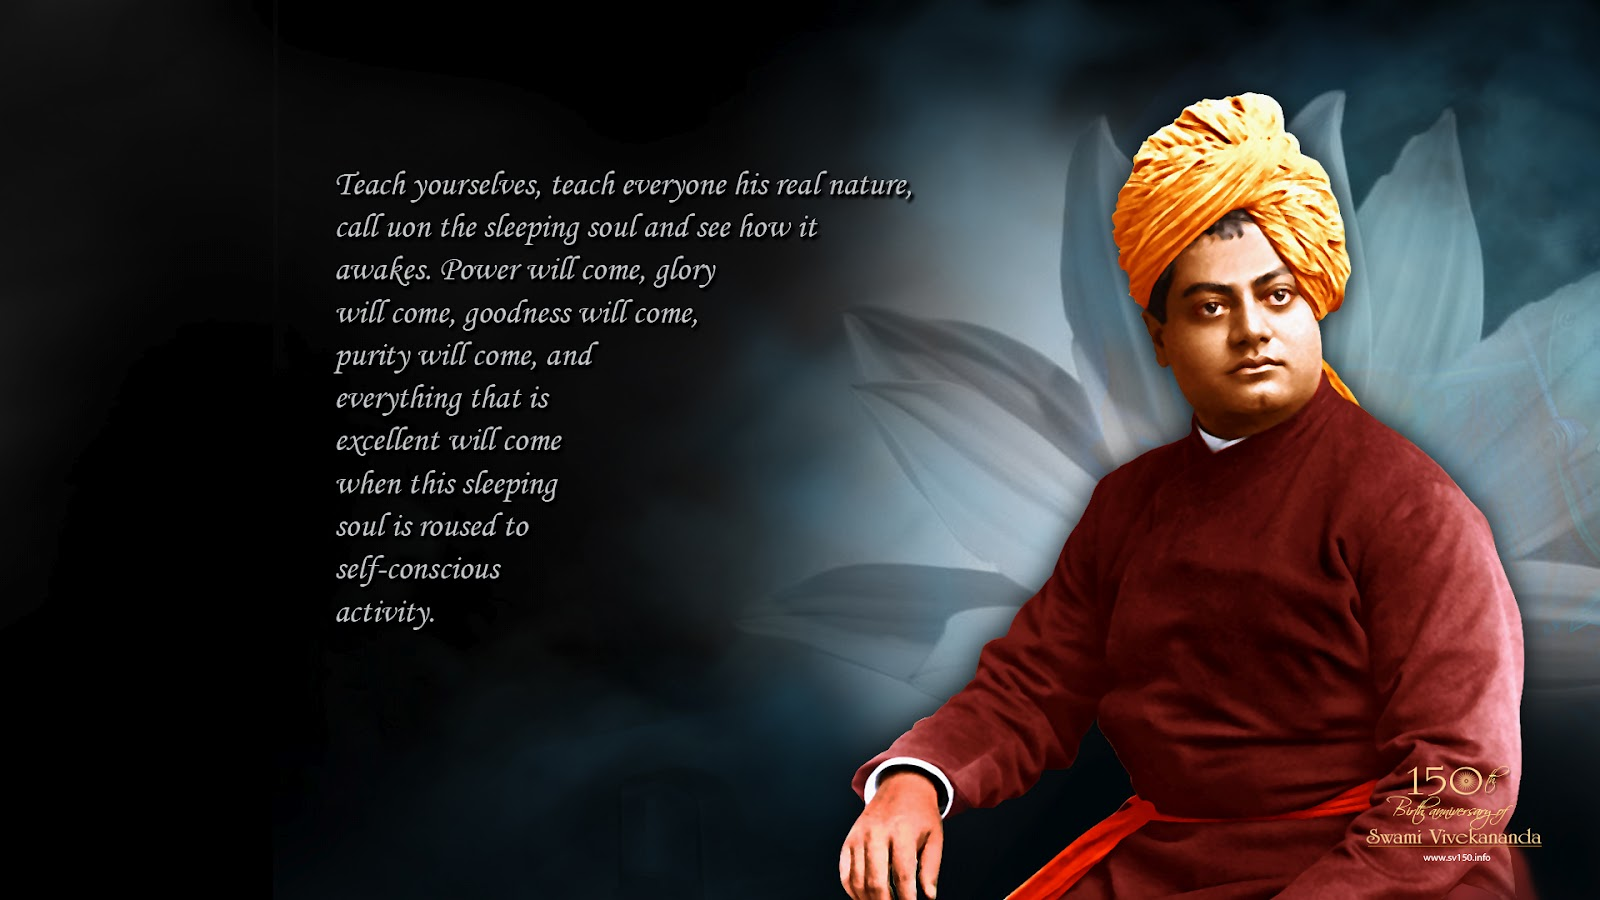 Swami Vivekananda Quotes Wallpapers In Kannada Veeru